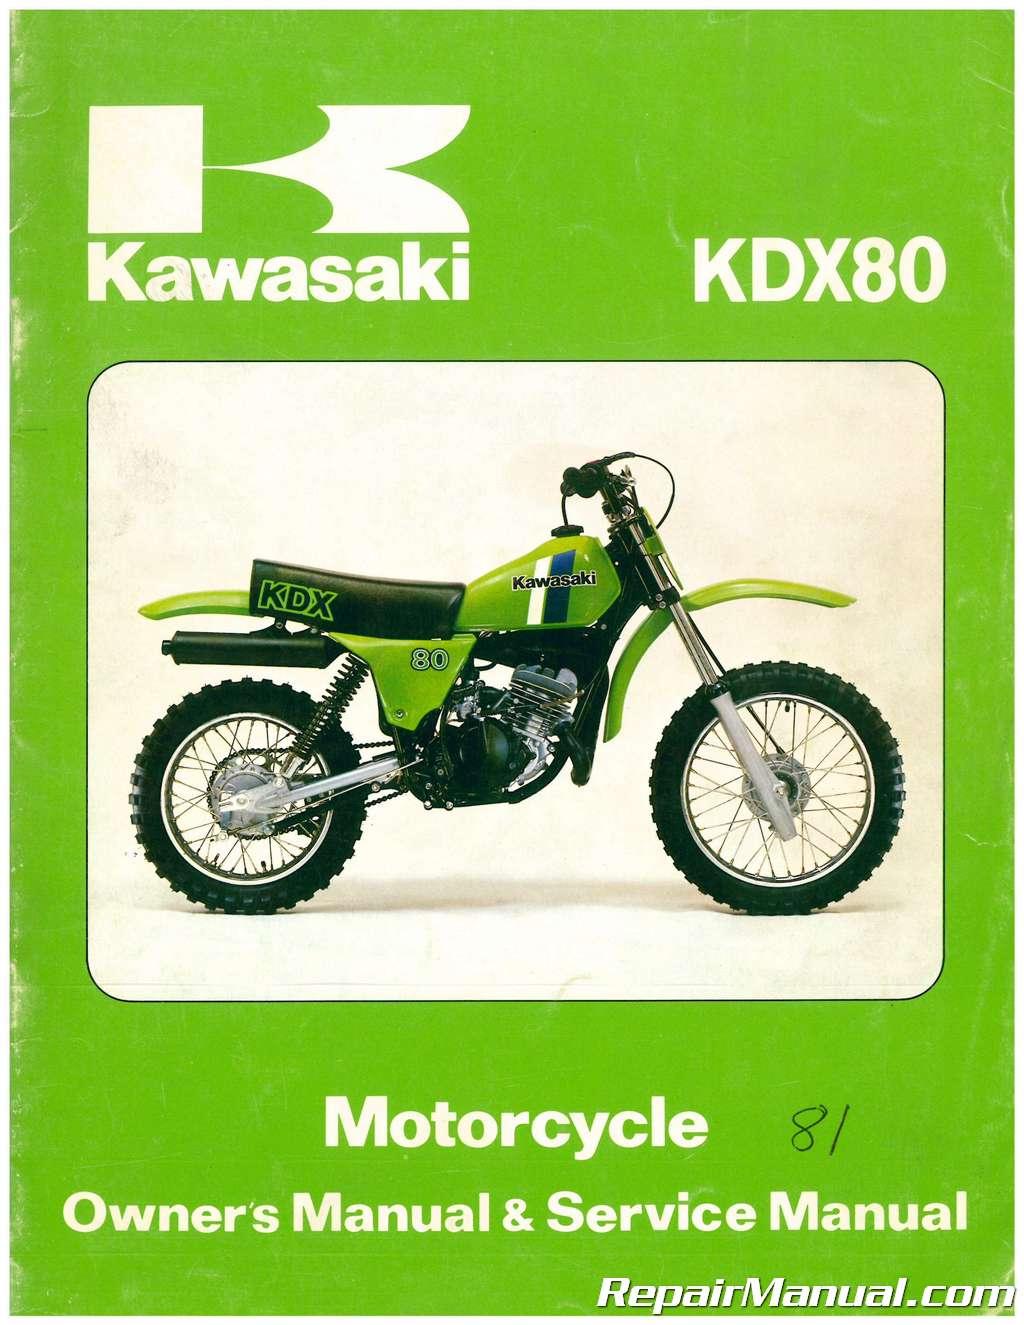 Kawasaki Kdx Owners Manual